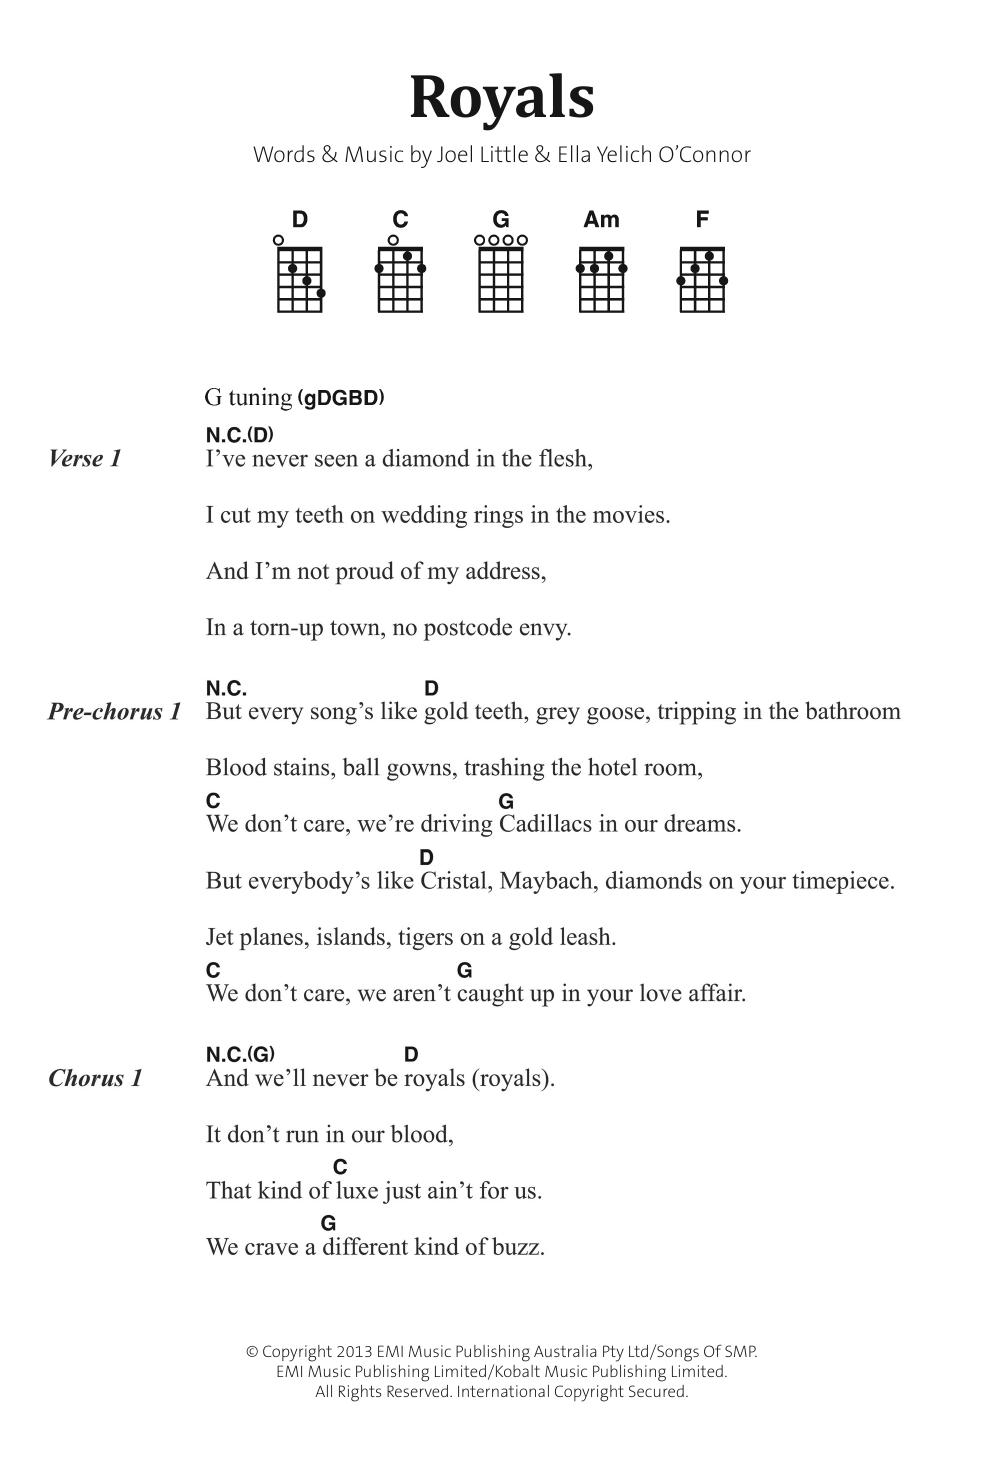 Royals Sheet Music